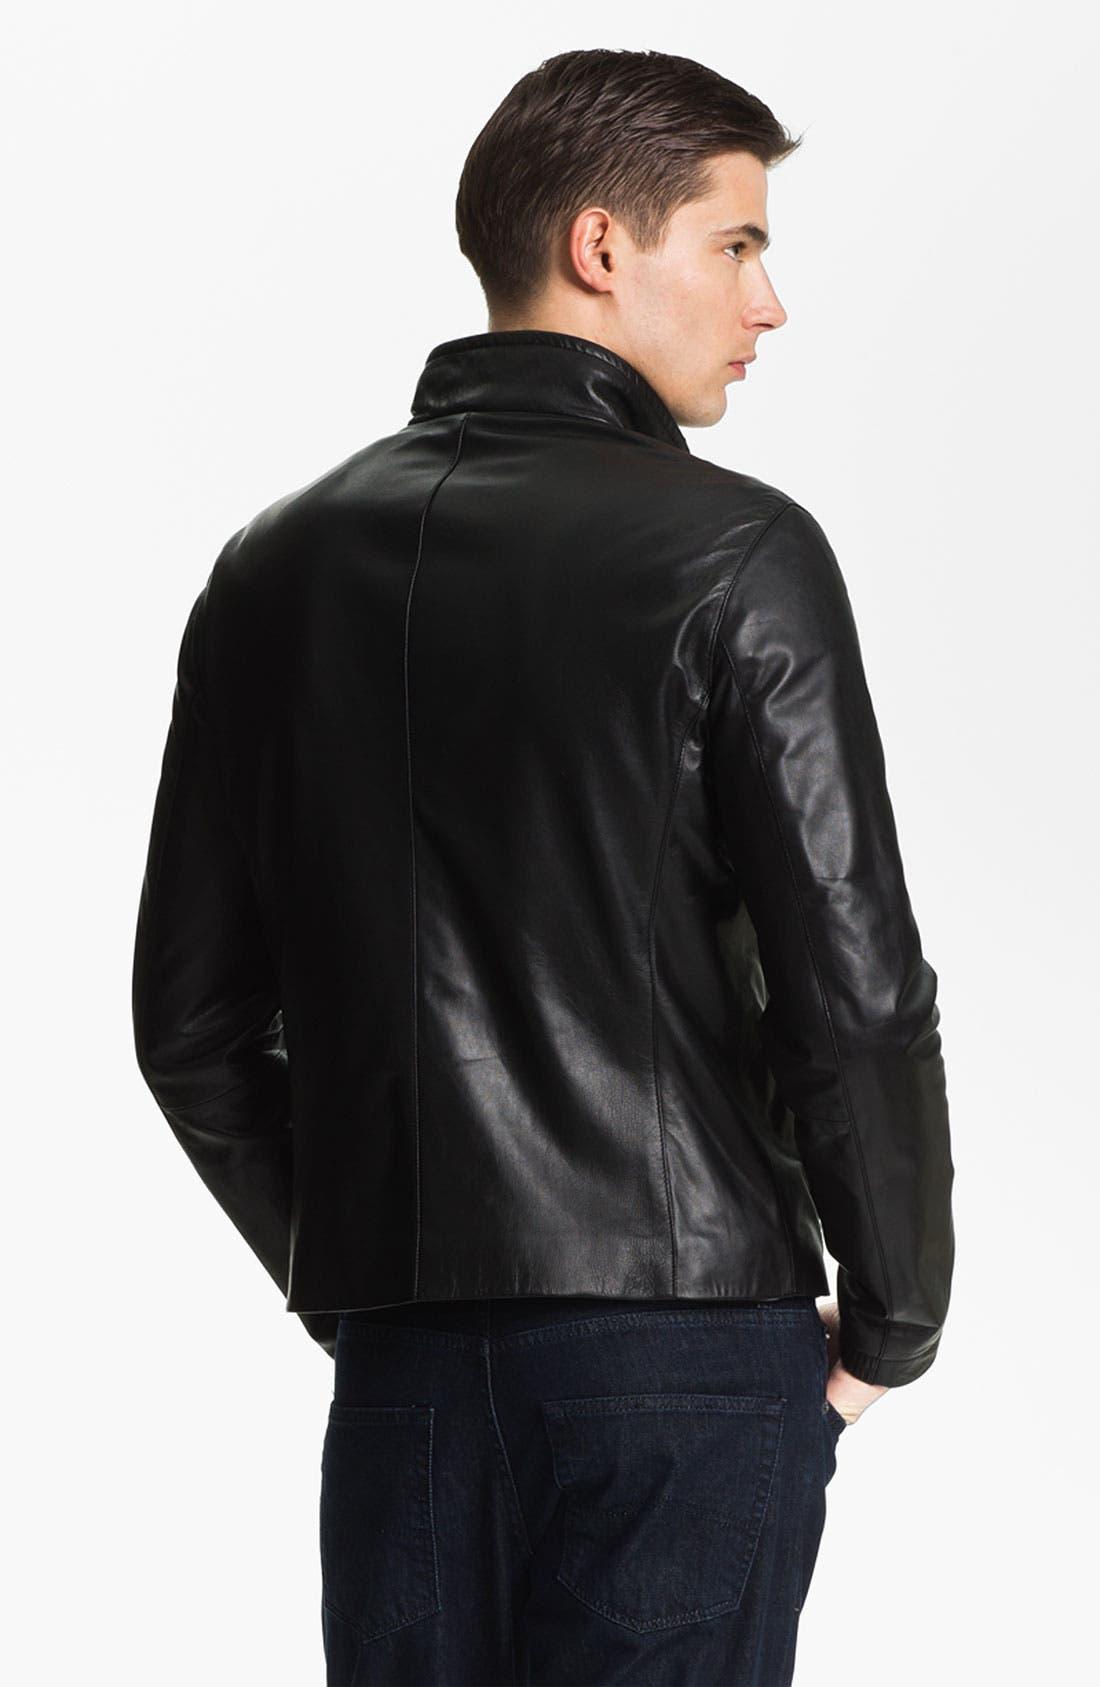 EMPORIO ARMANI,                             Armani Collezioni Blouson Leather Jacket,                             Alternate thumbnail 6, color,                             001